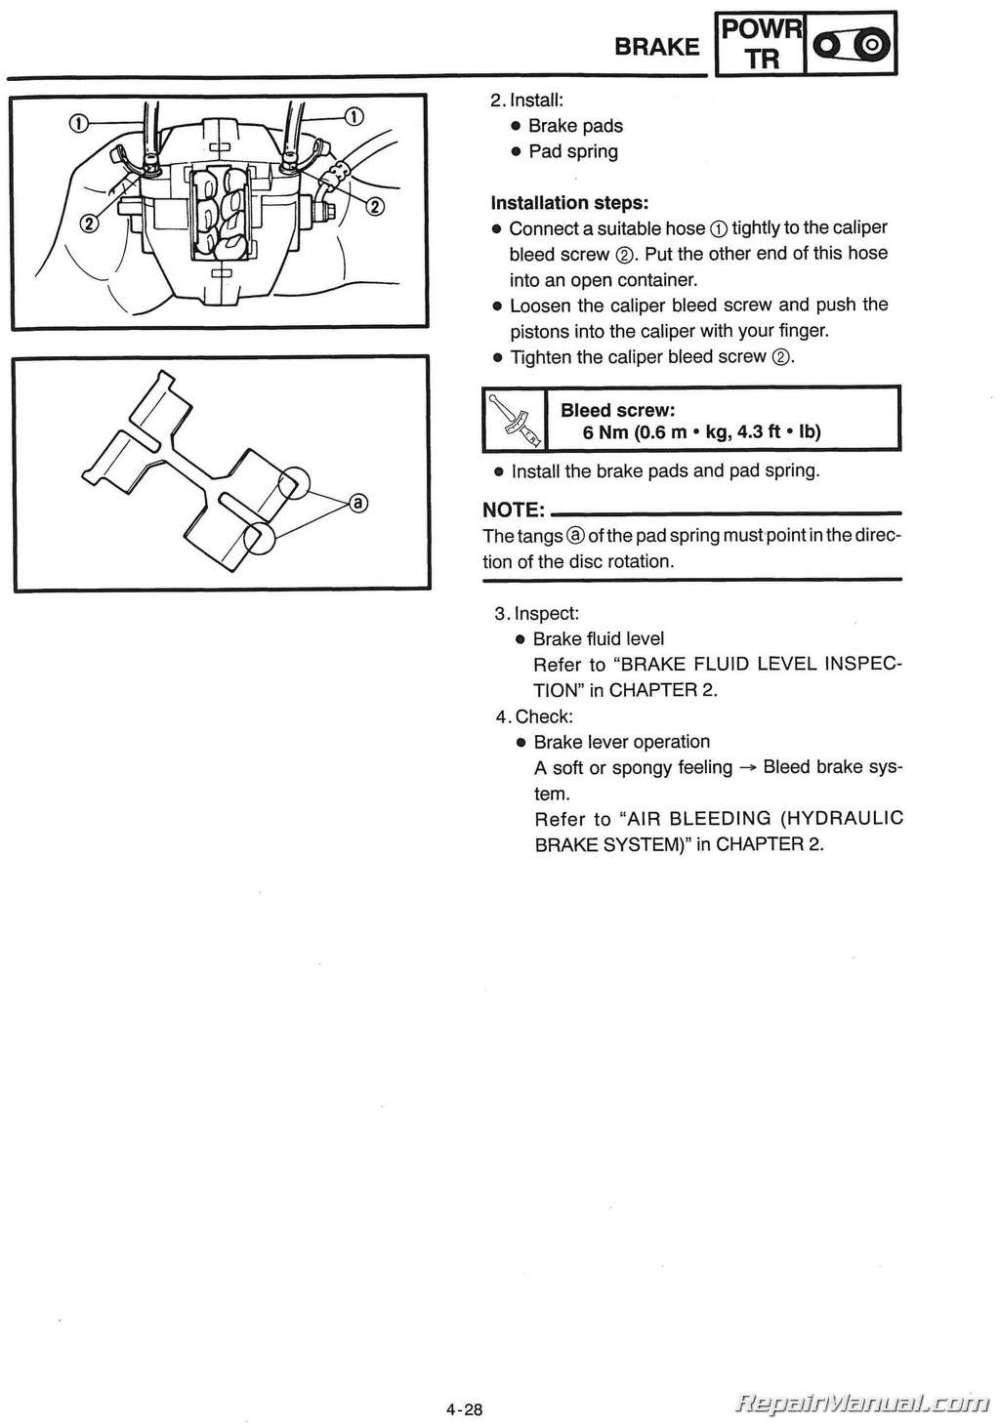 medium resolution of 1999 2001 yamaha snowmobile service manual pz500 phazer vt500xl venture 500 xl